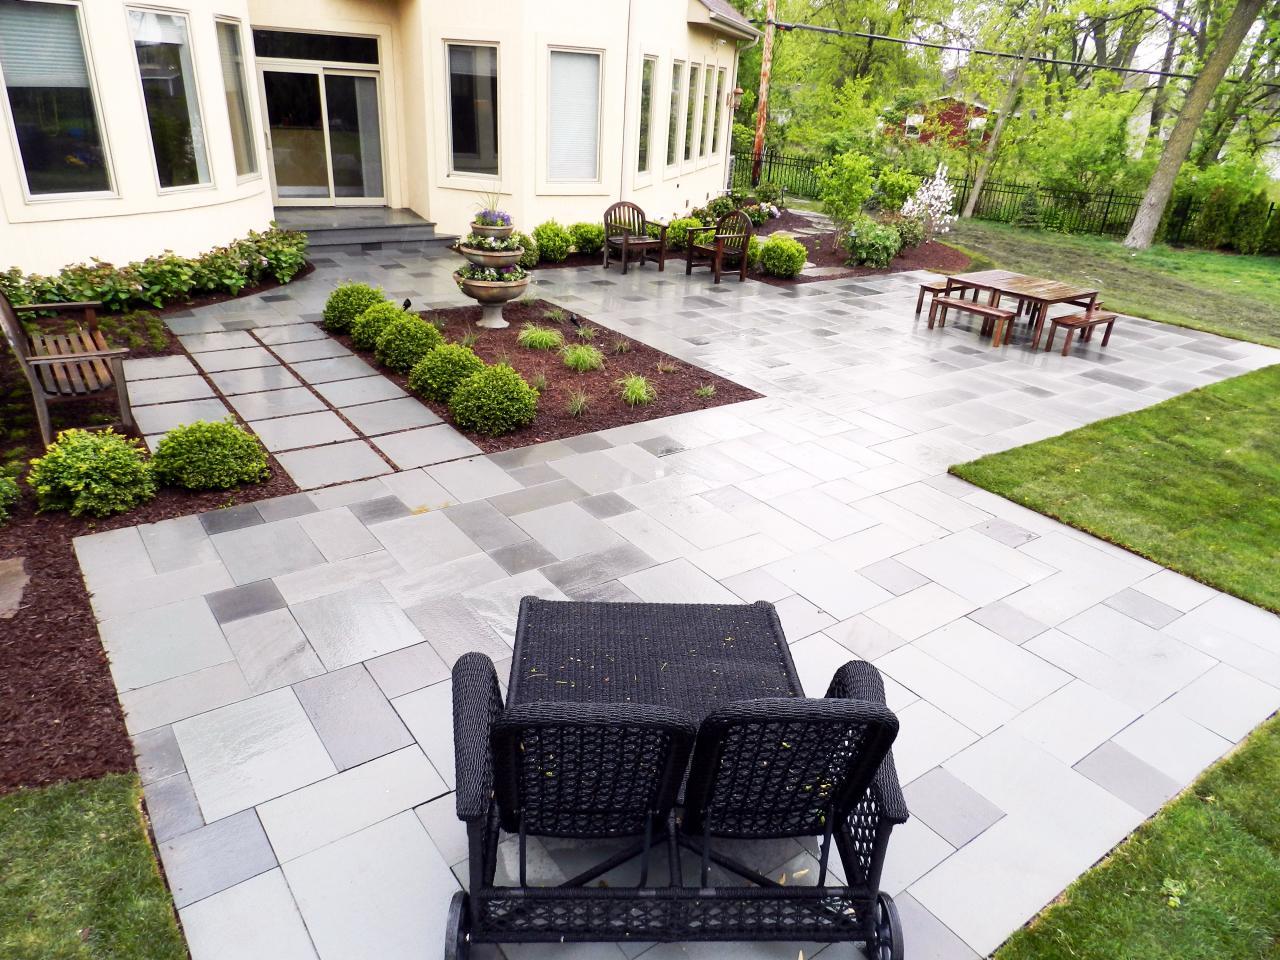 Contemporary Patio With Sleek Gray Stone | HGTV on Modern Backyard Patio id=87188